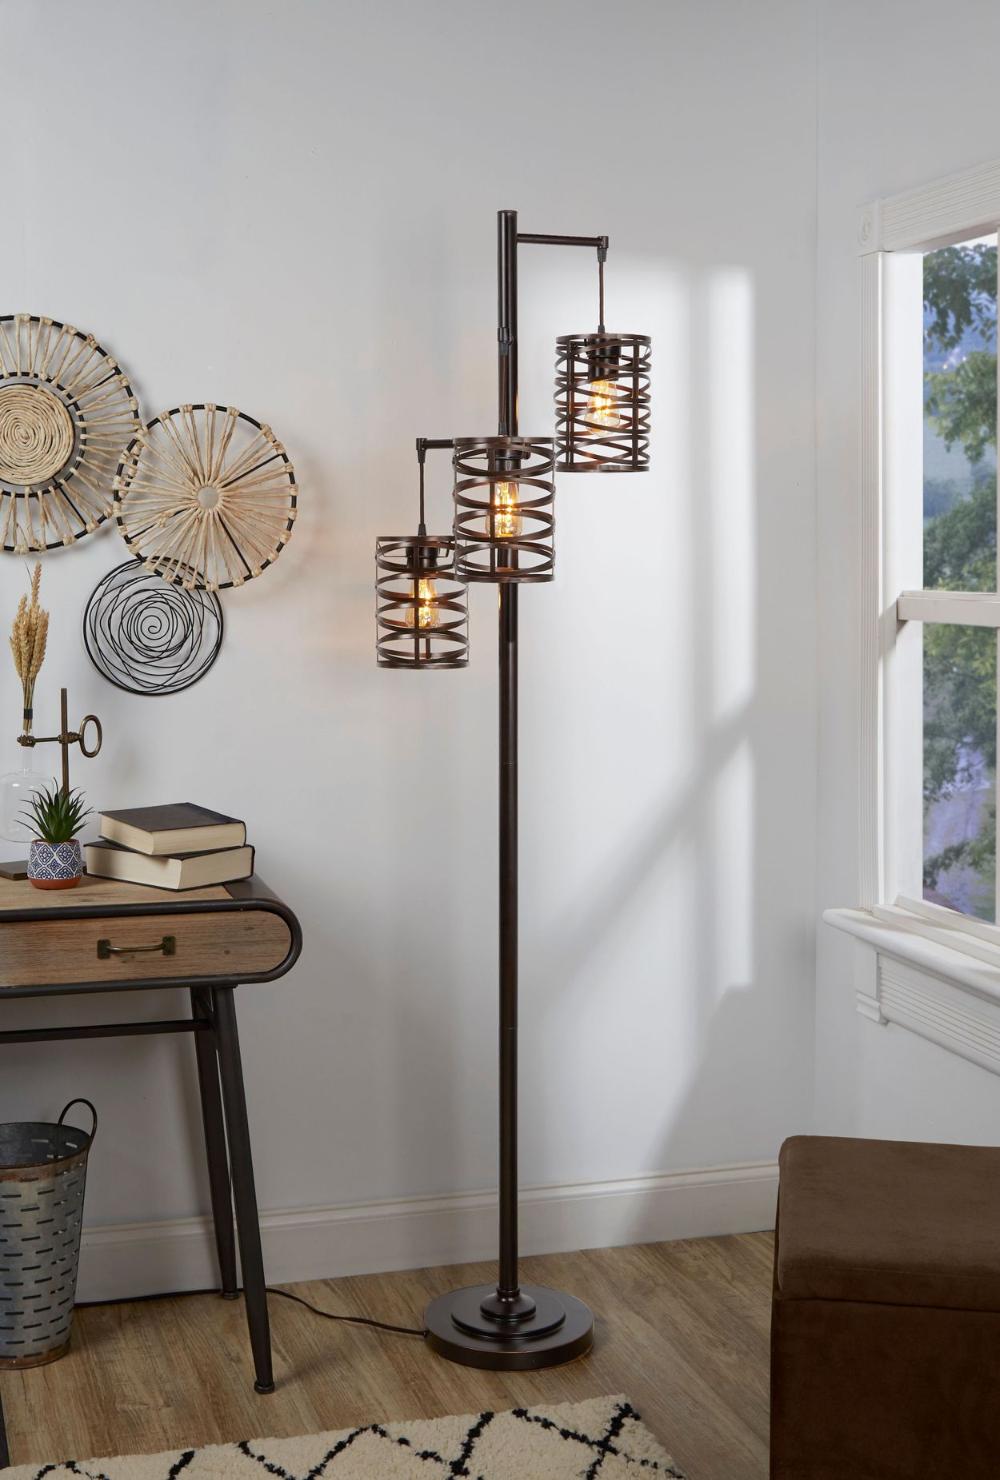 Brady 3 Arm Floor Lamp In 2020 Arm Floor Lamp Floor Lamp Flooring